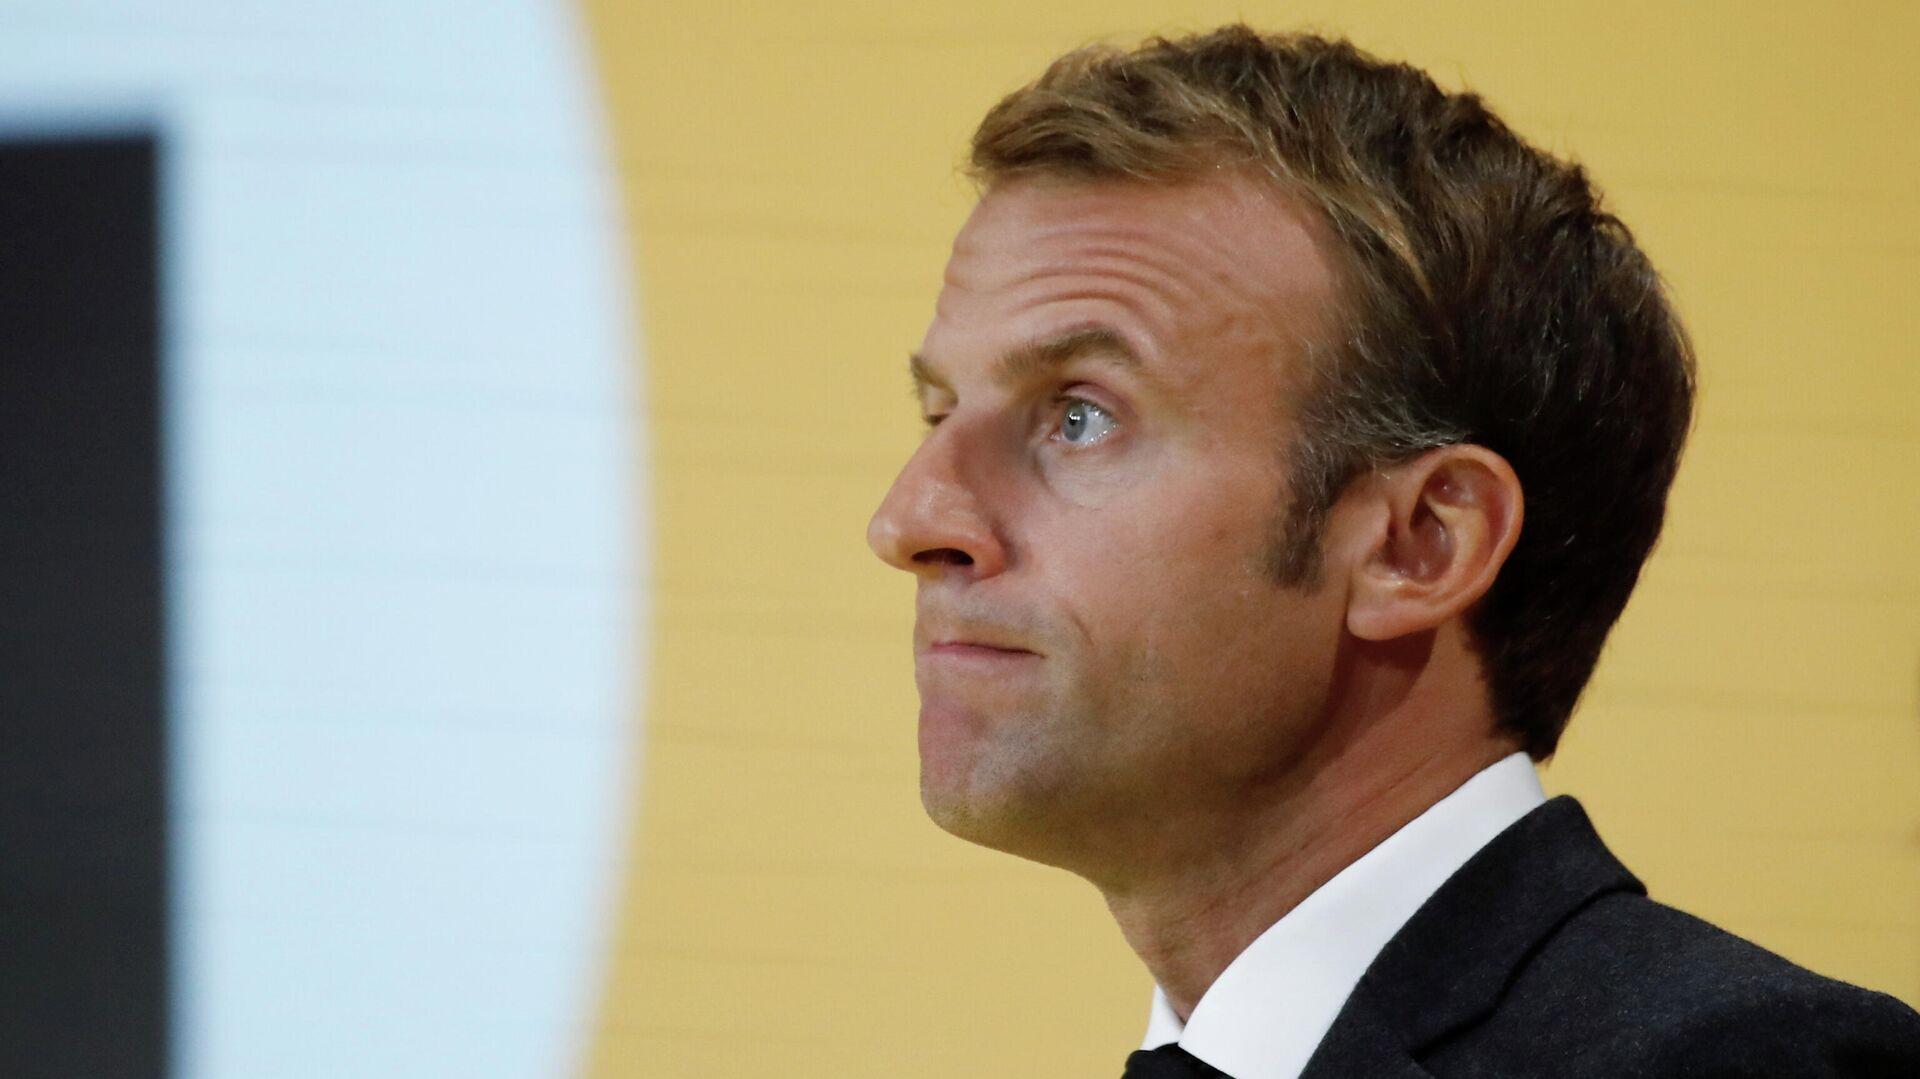 Emmanuel Macron, presidente de Francia - Sputnik Mundo, 1920, 10.10.2021